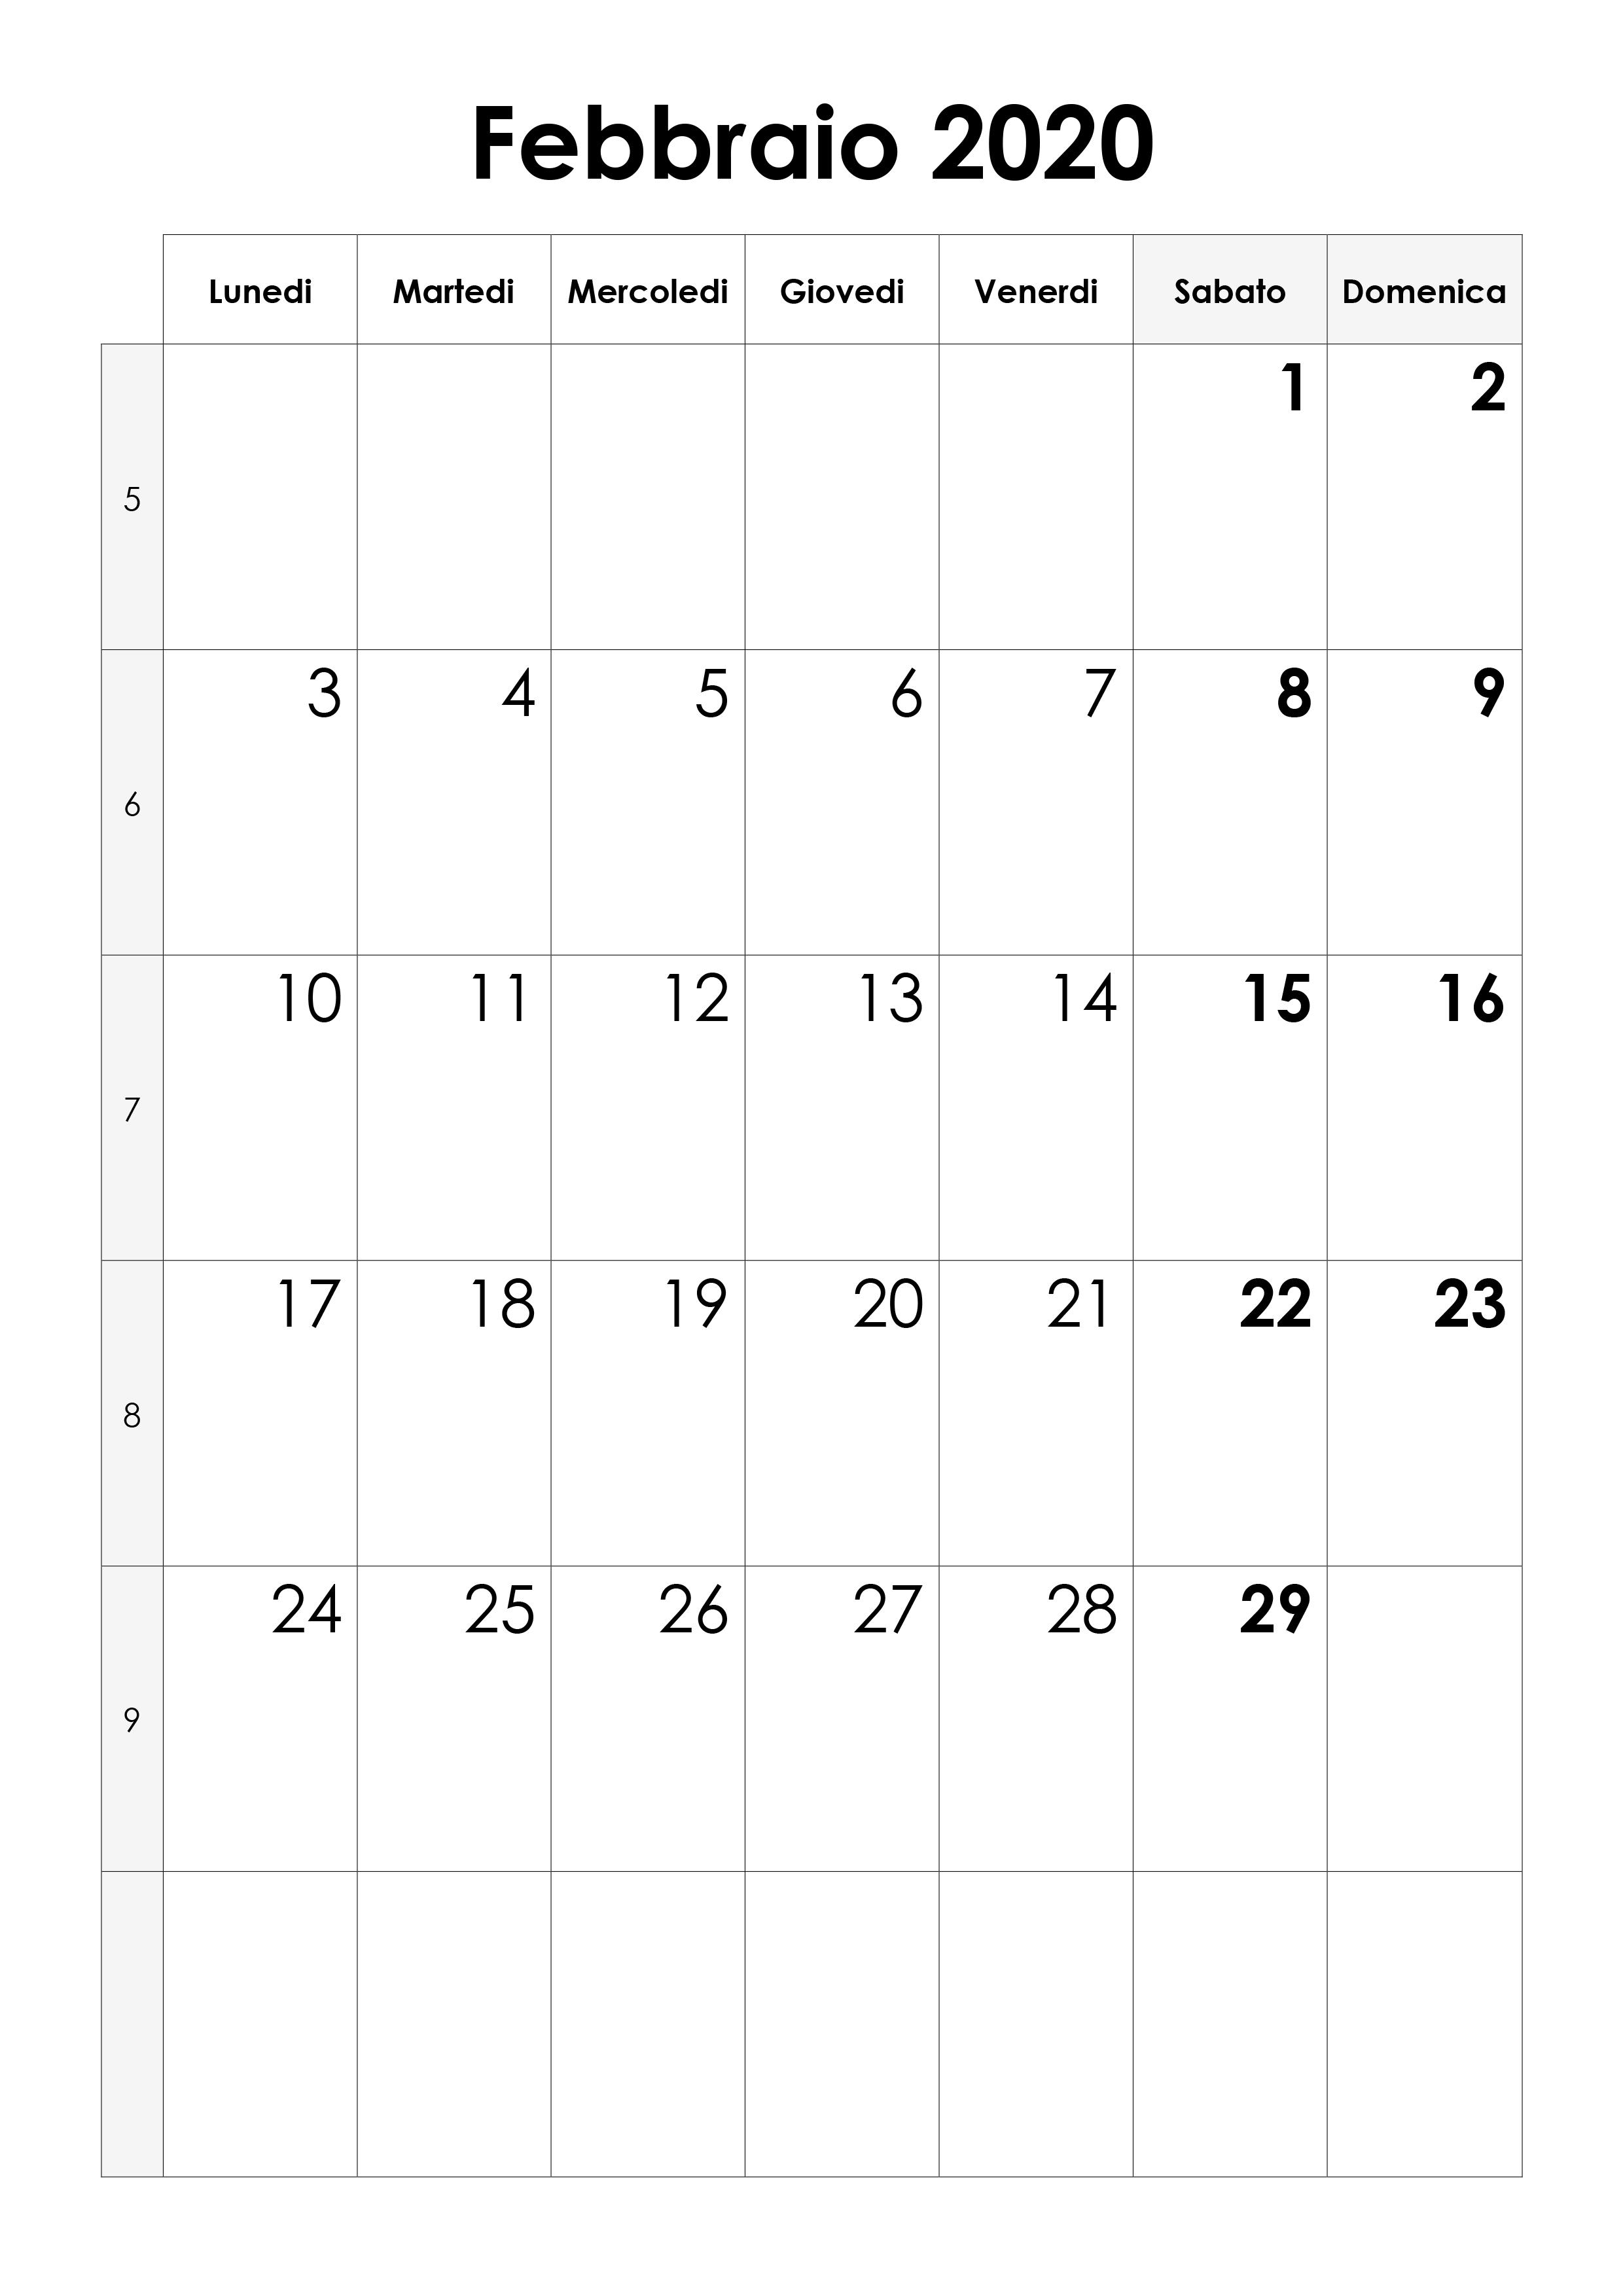 Calendario Febbraio Marzo 2020.Calendario Febbraio 2020 Calendario Su